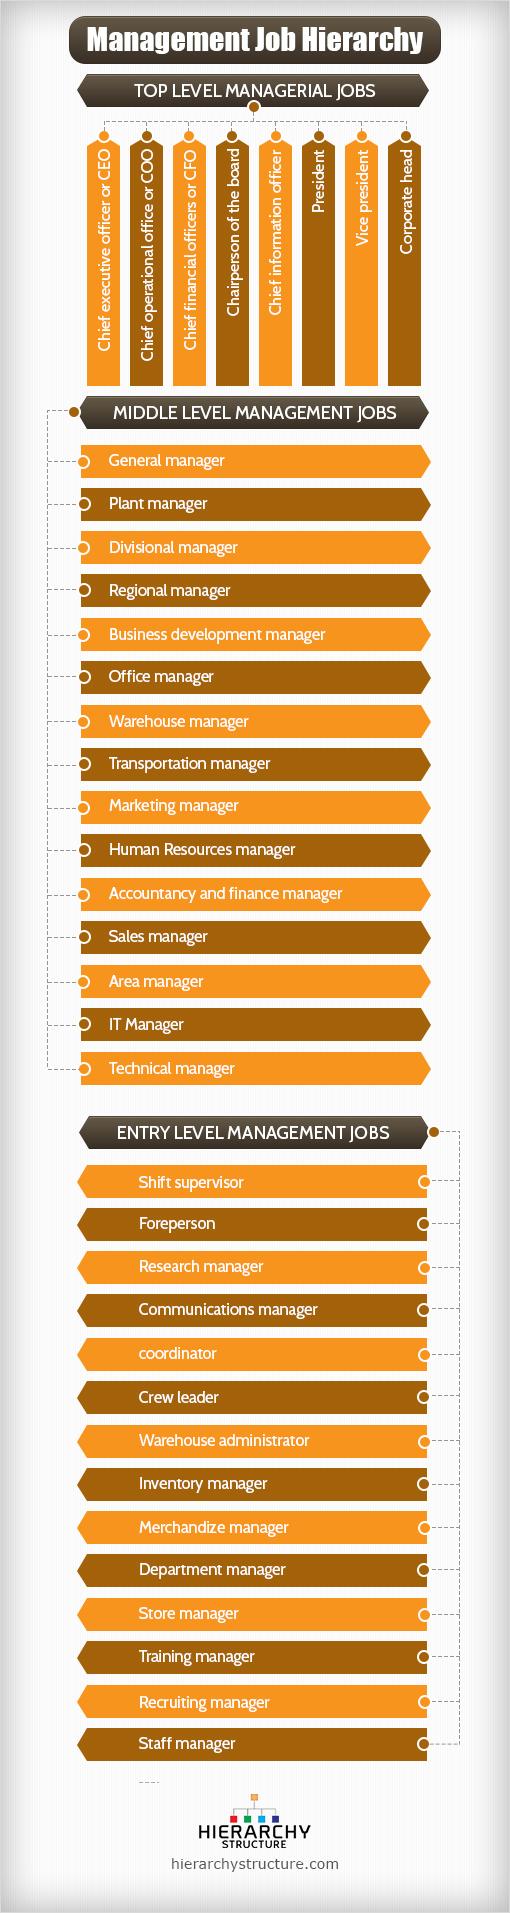 management job hierarchy